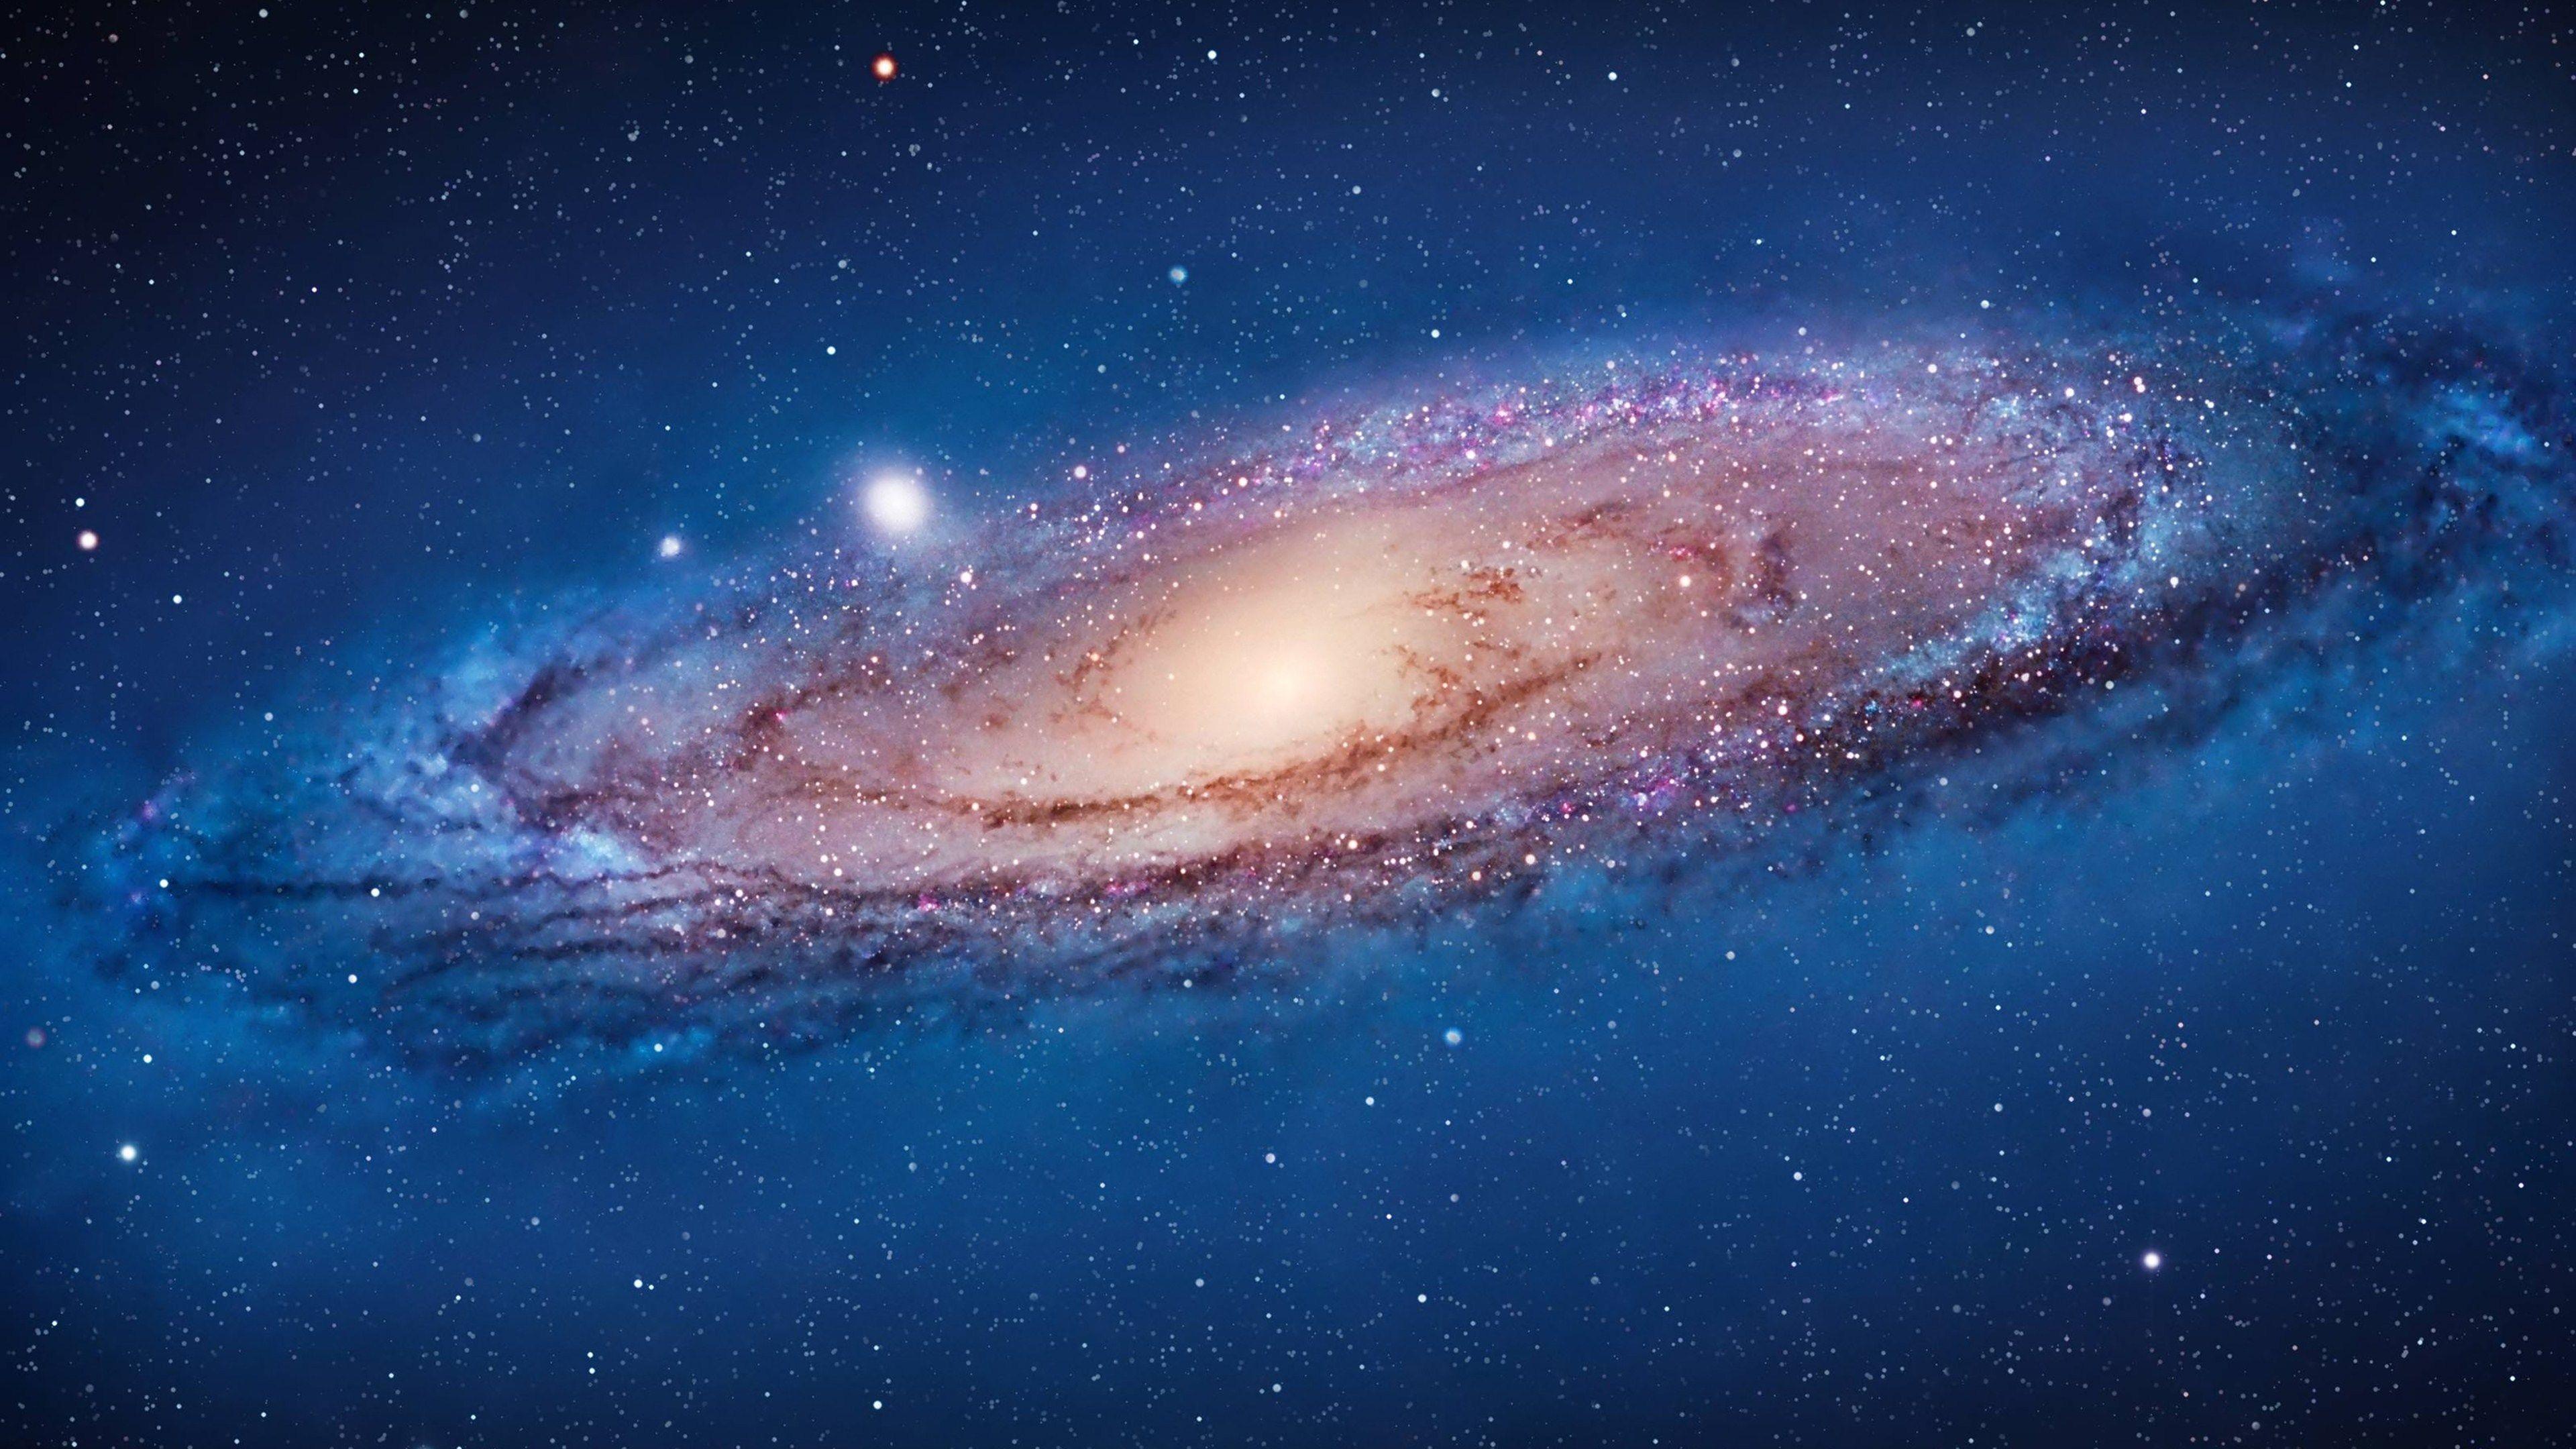 Space Galaxy 4k Wallpaper. #3938